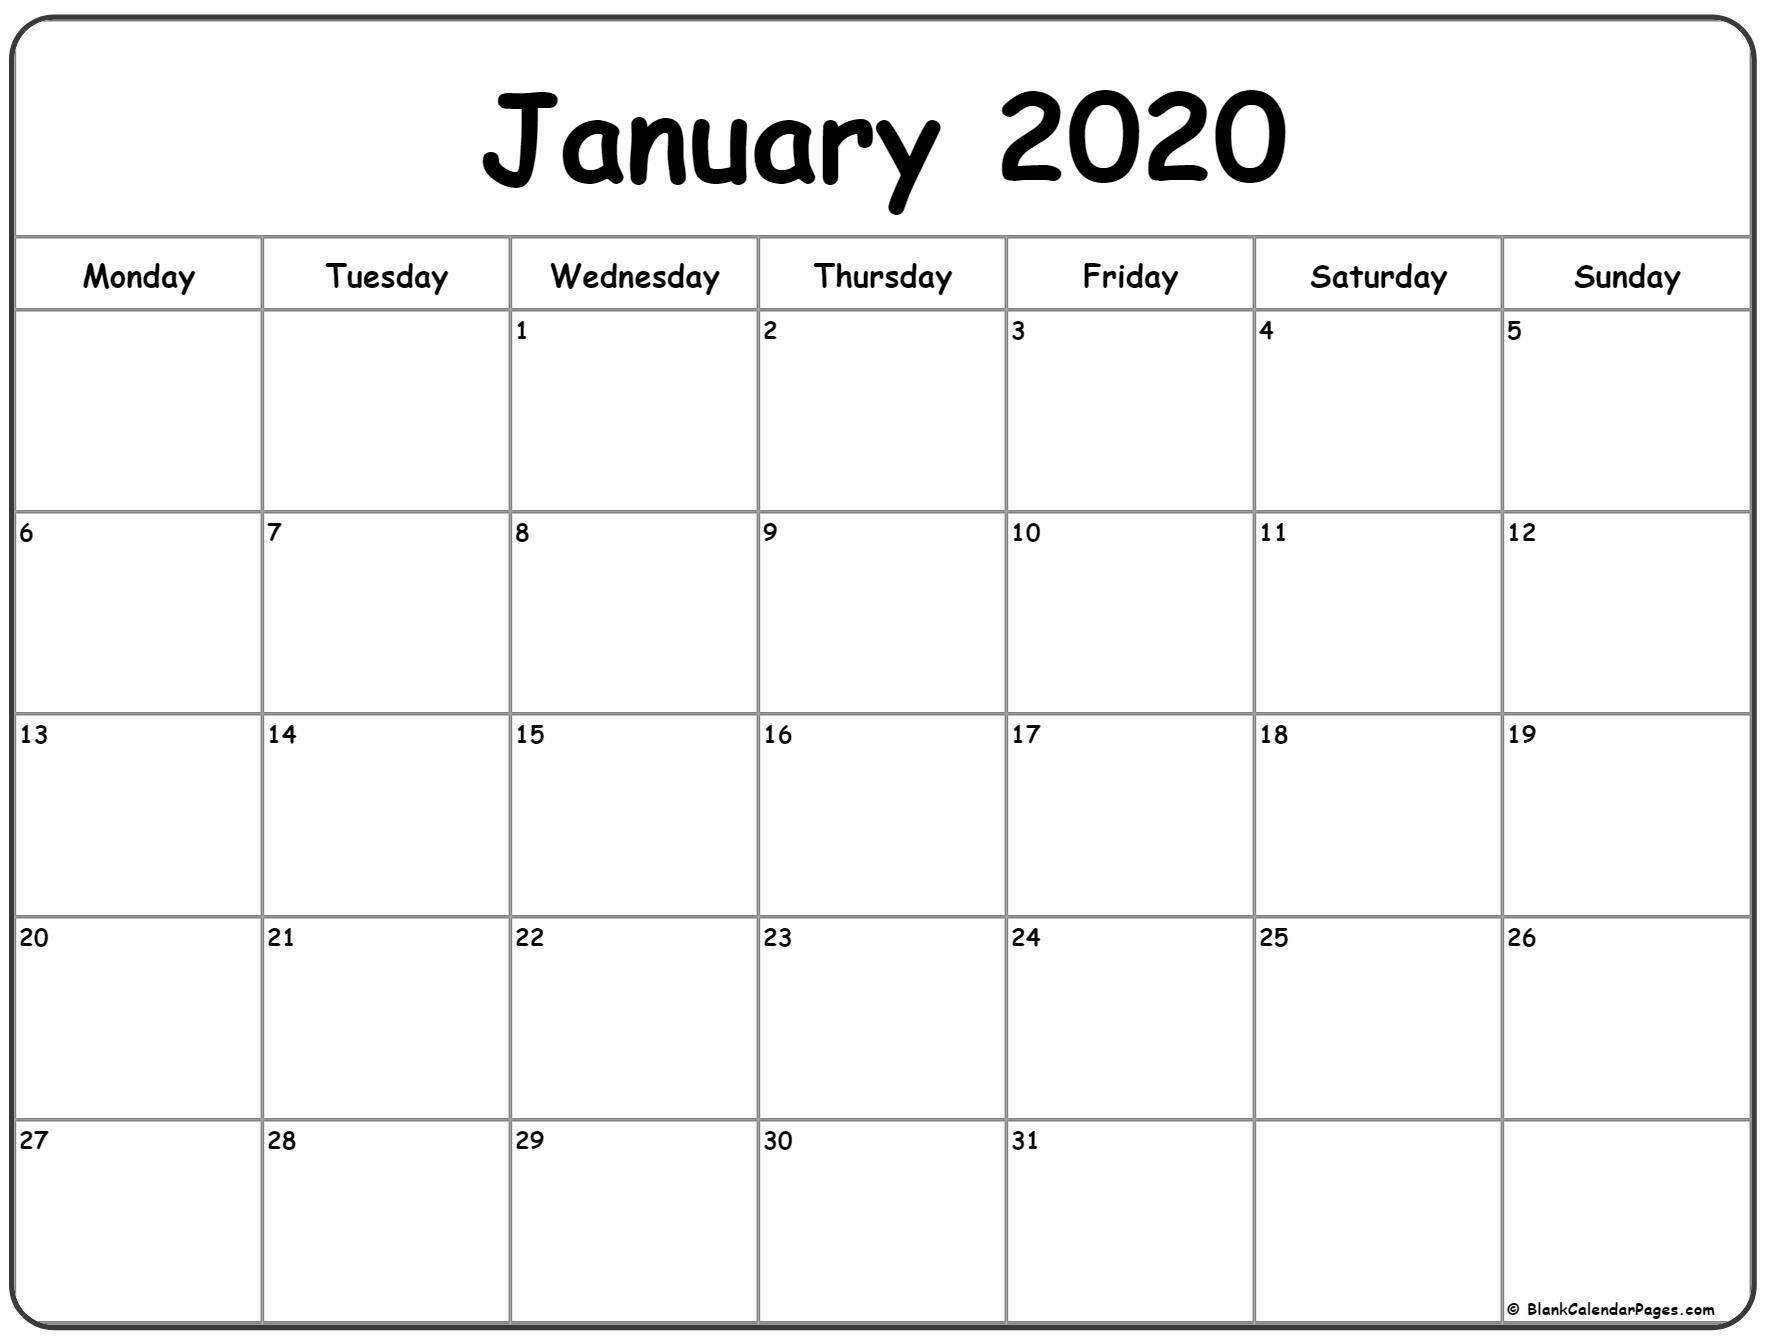 January 2020 Monday Calendar | Monday To Sunday-January 2020 Calendar Monday Start